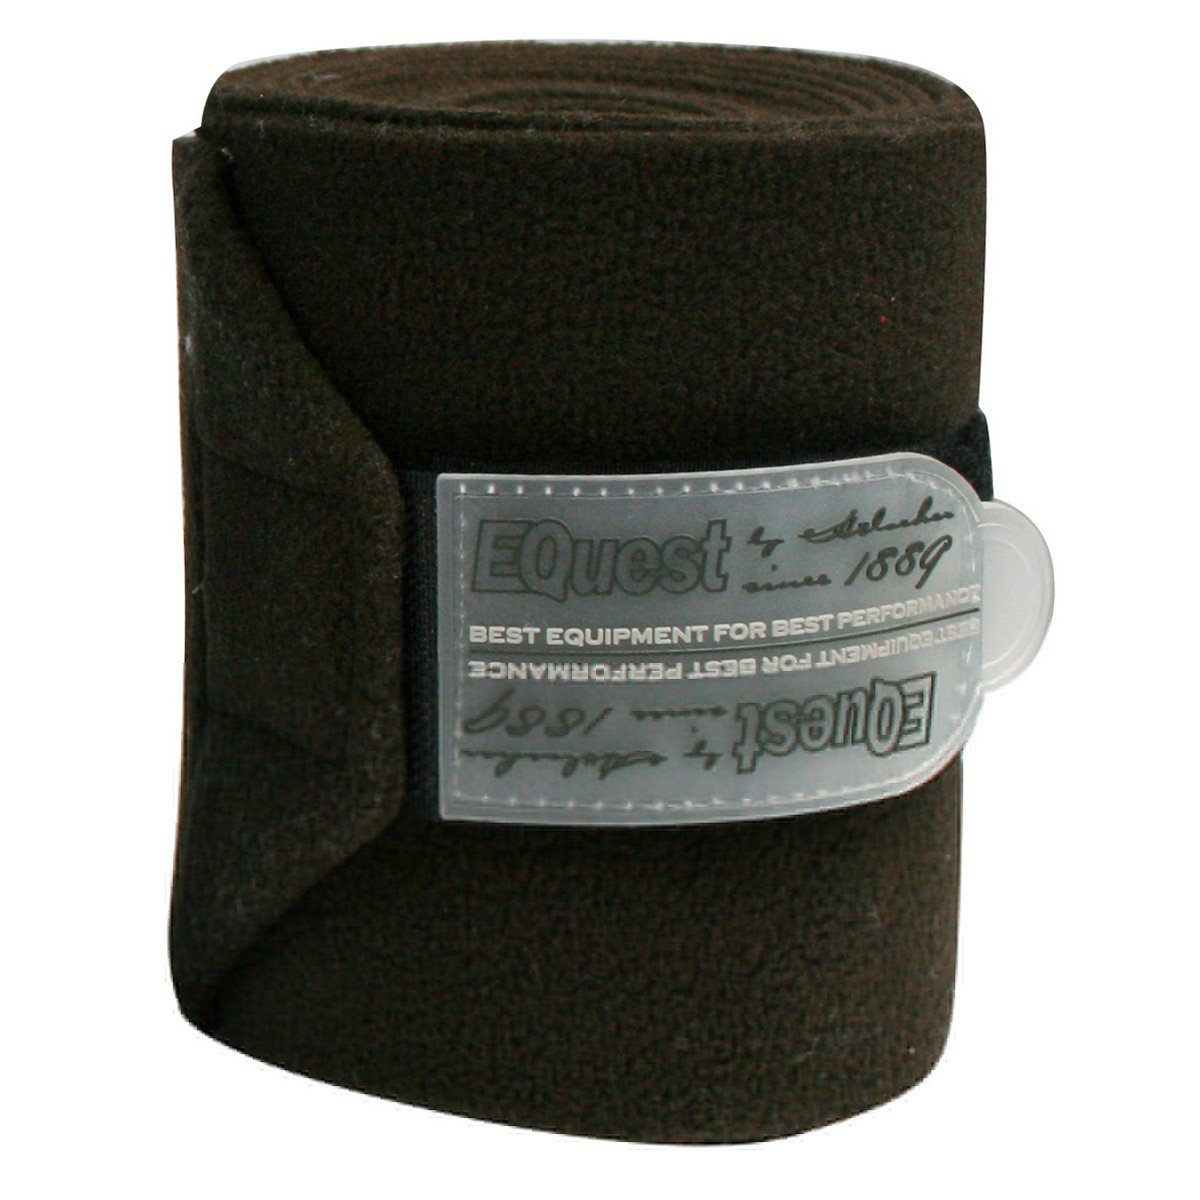 Afbeelding van EQuest Bandage Alpha Fleece 4st 12cm Mokka 3m